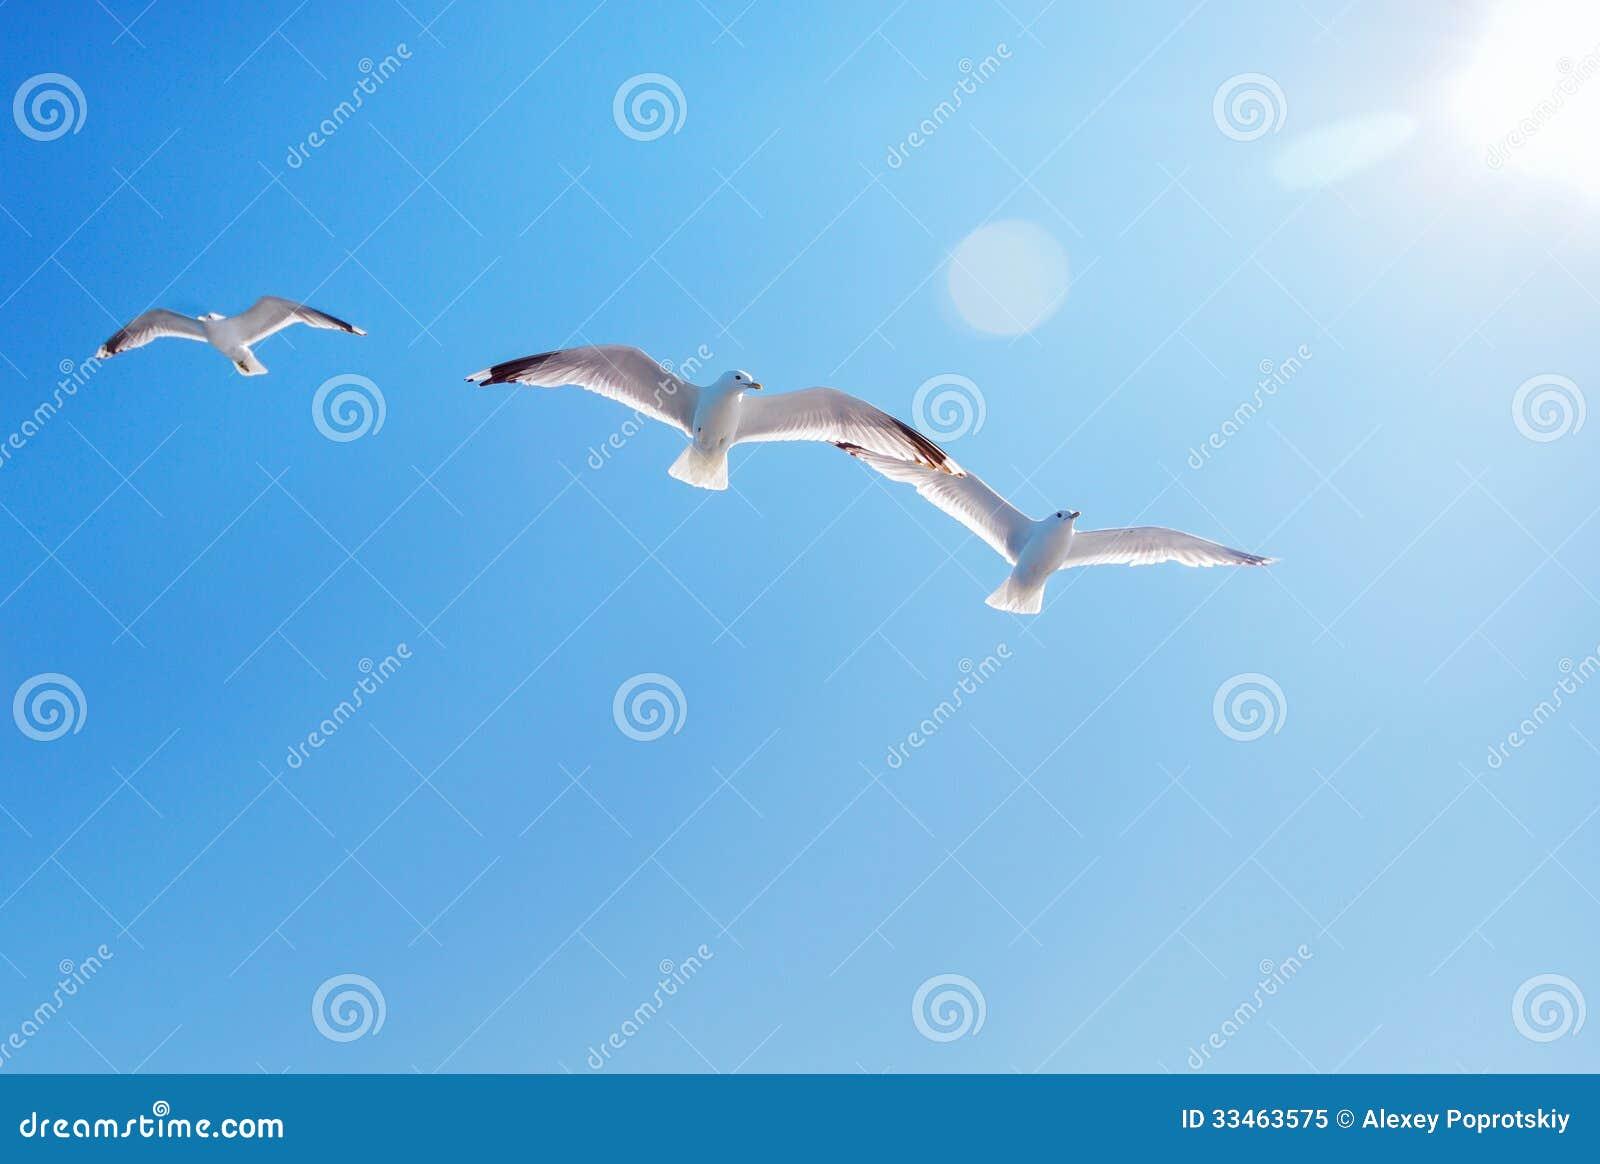 Three seagulls and sun